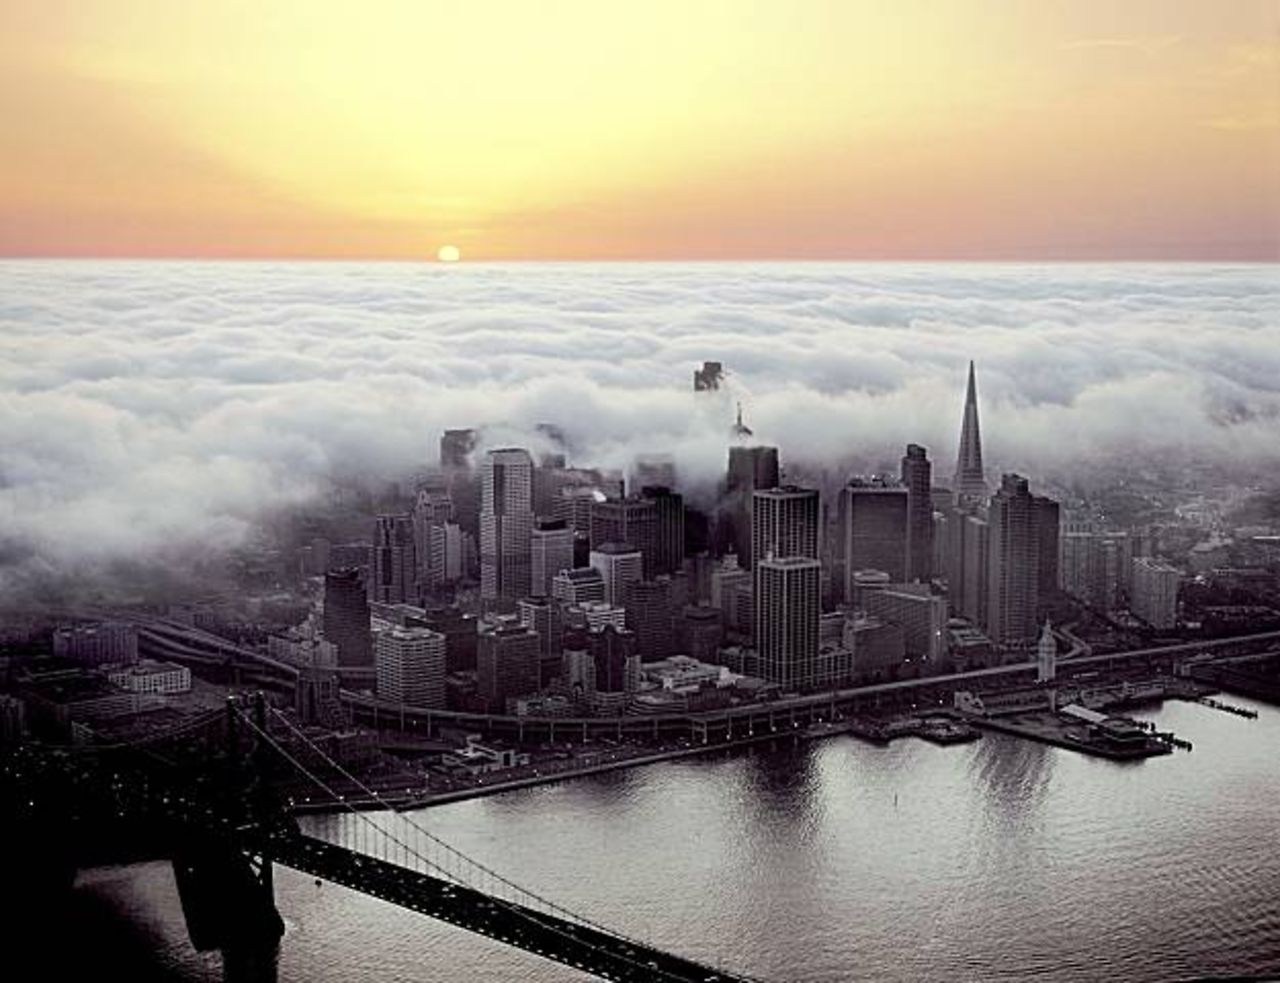 san francisco, fog, sunset, scenery